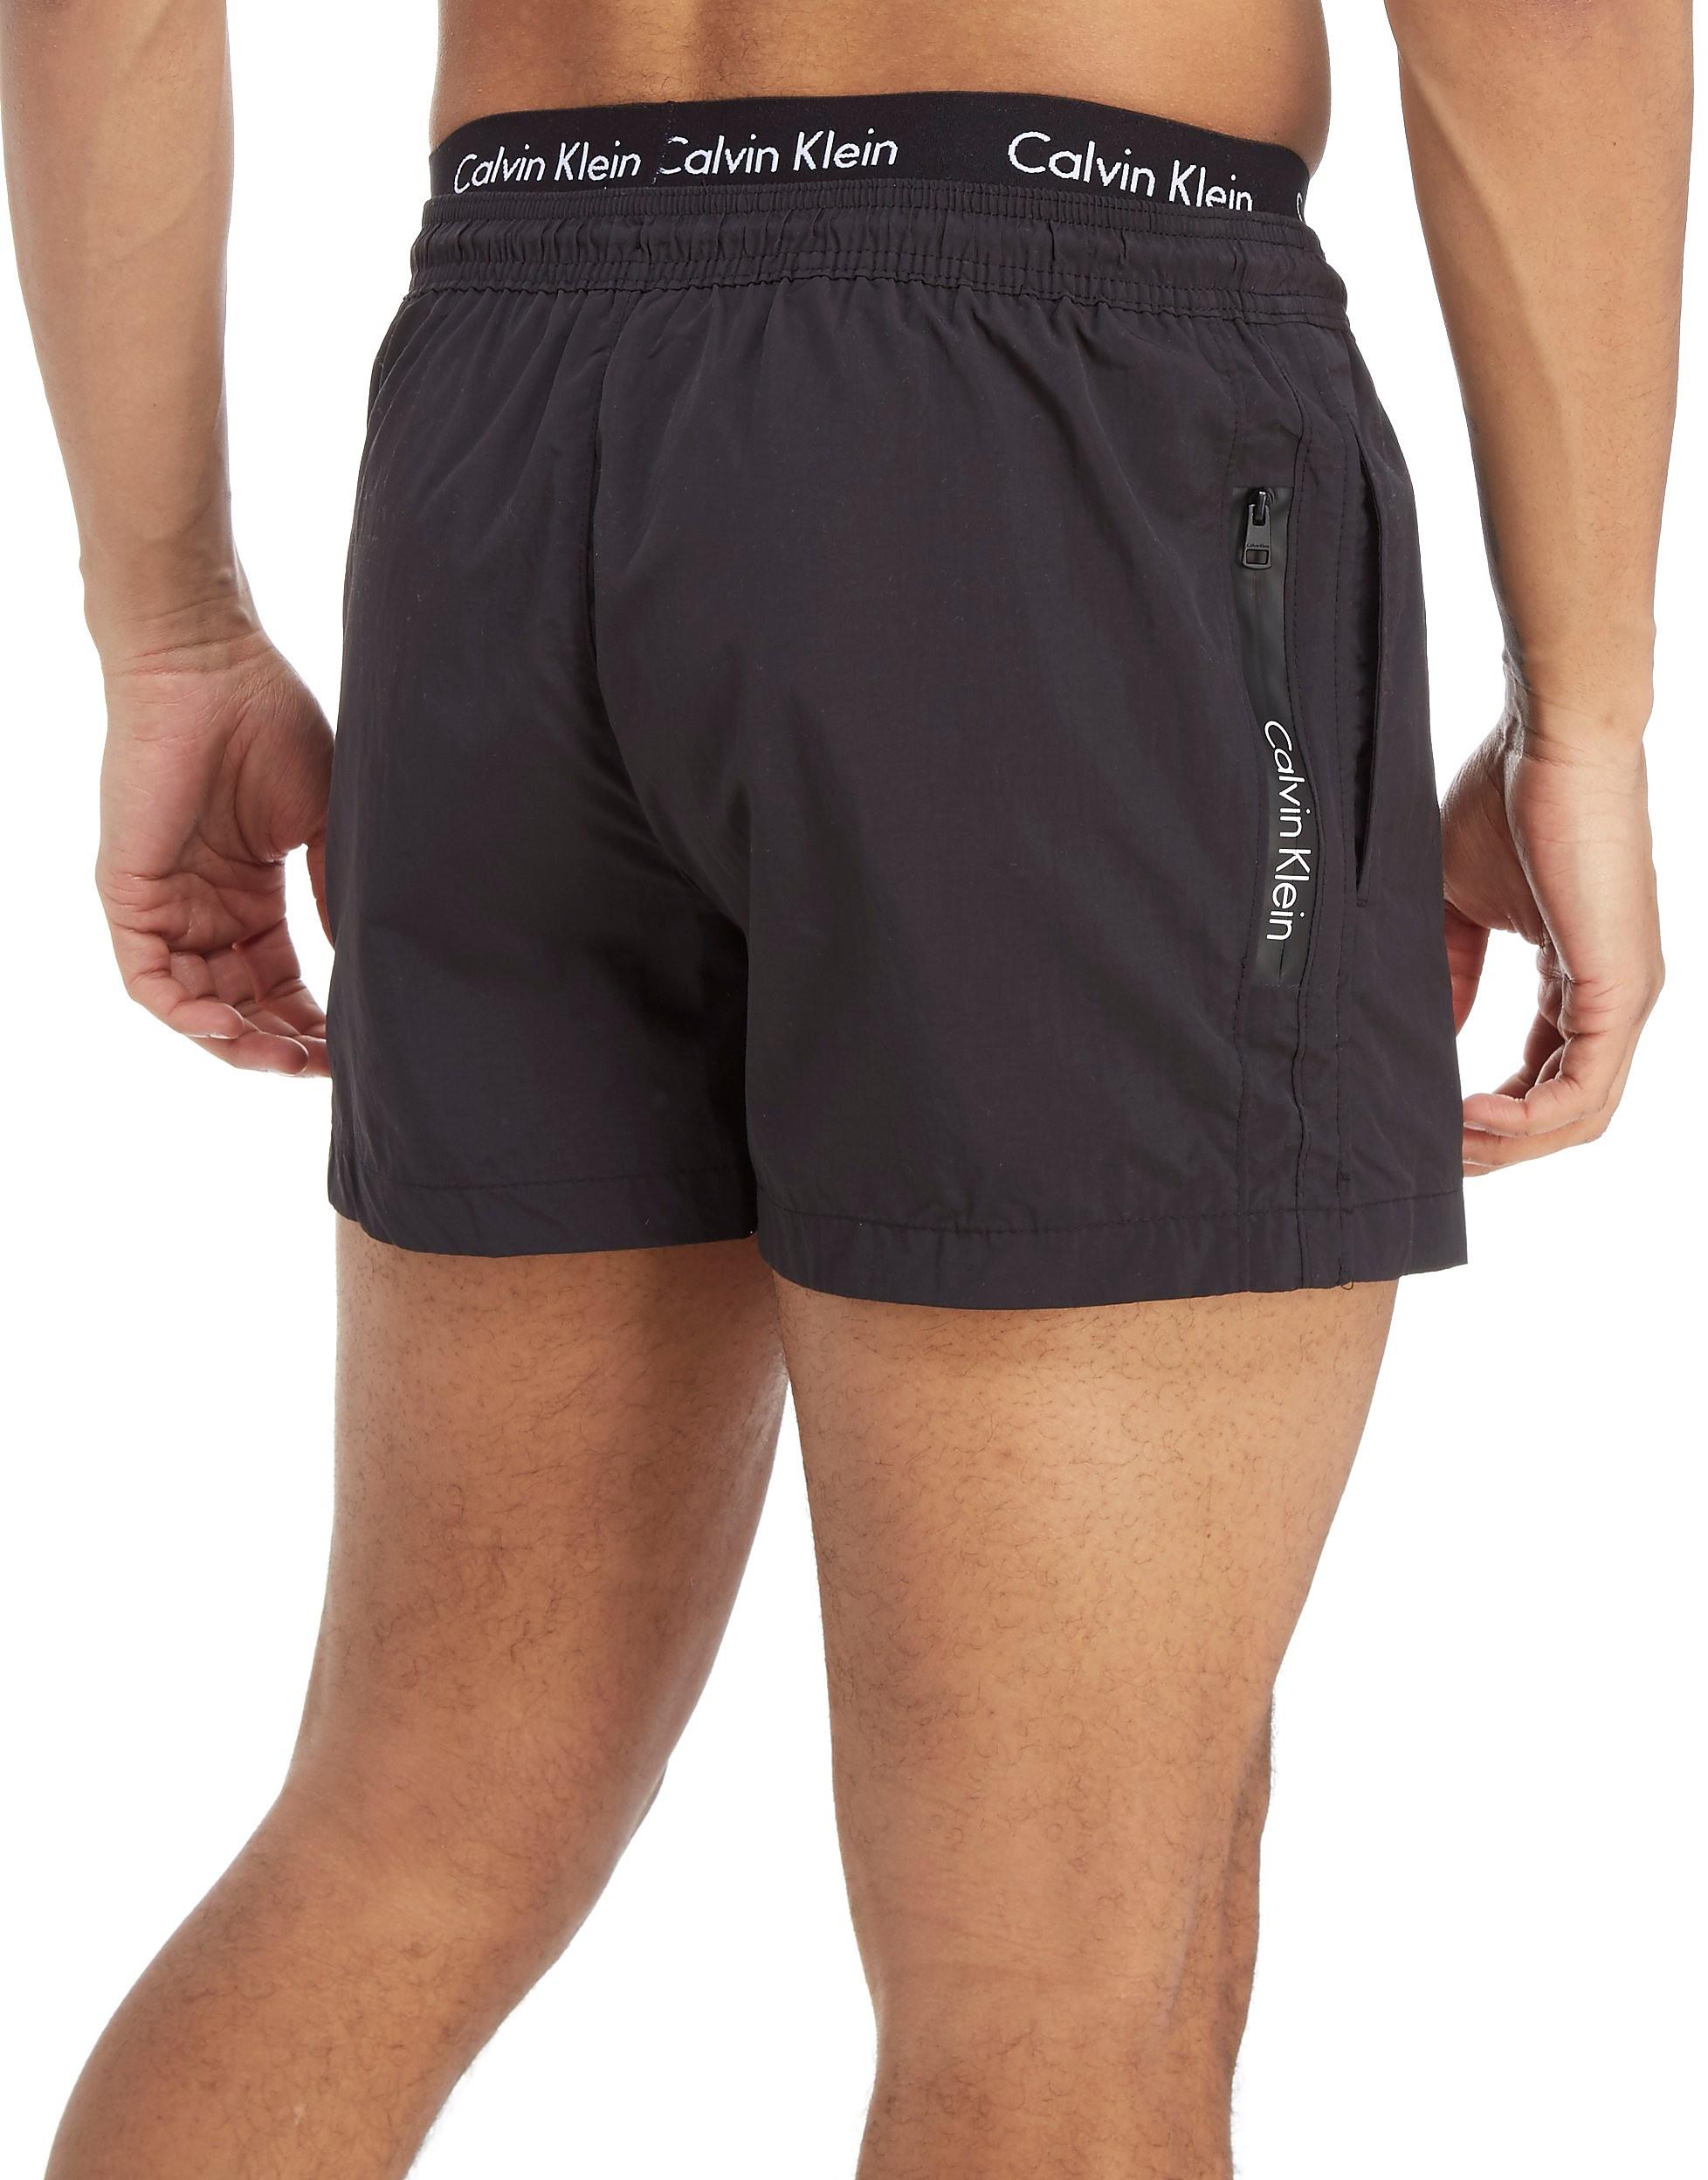 Calvin Klein Waist Band Shorts